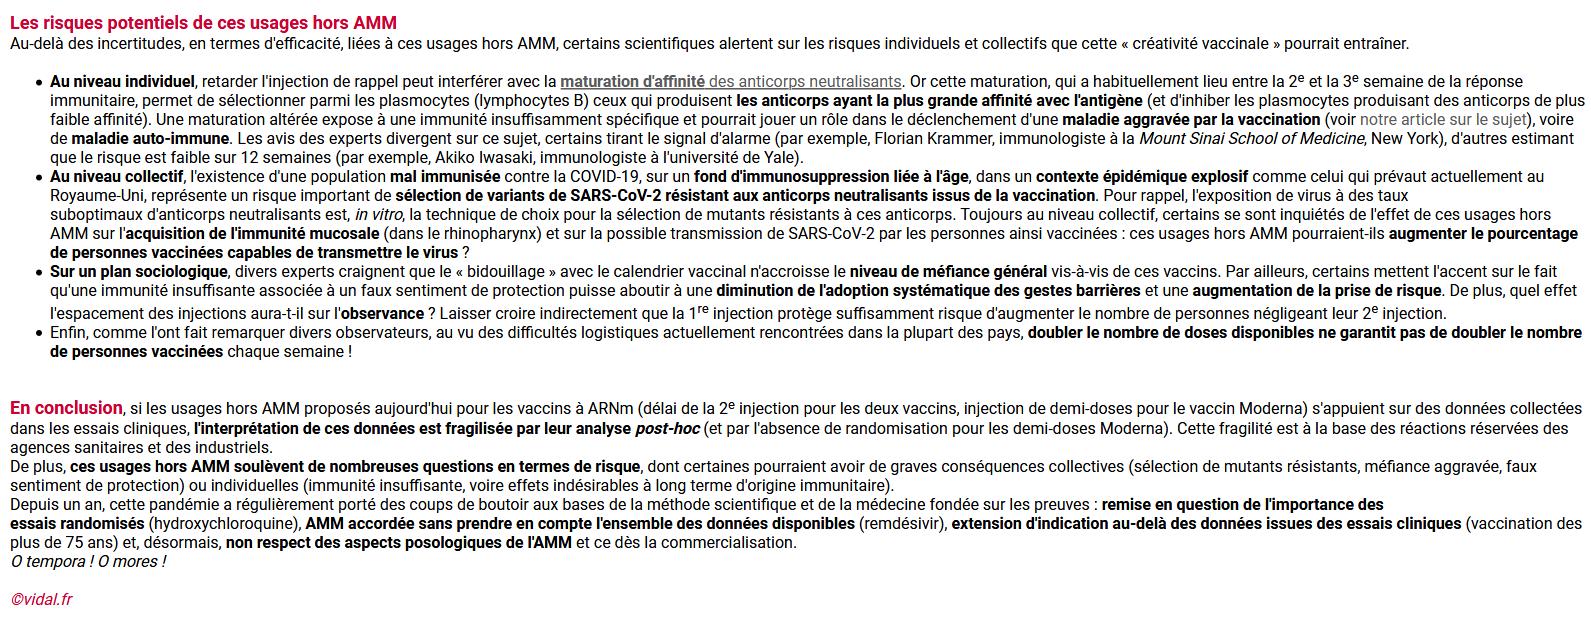 Screenshot_2021-01-08 COVID19 חיסונים רוח של יצירתיות בלוח הזמנים של החיסונים .png